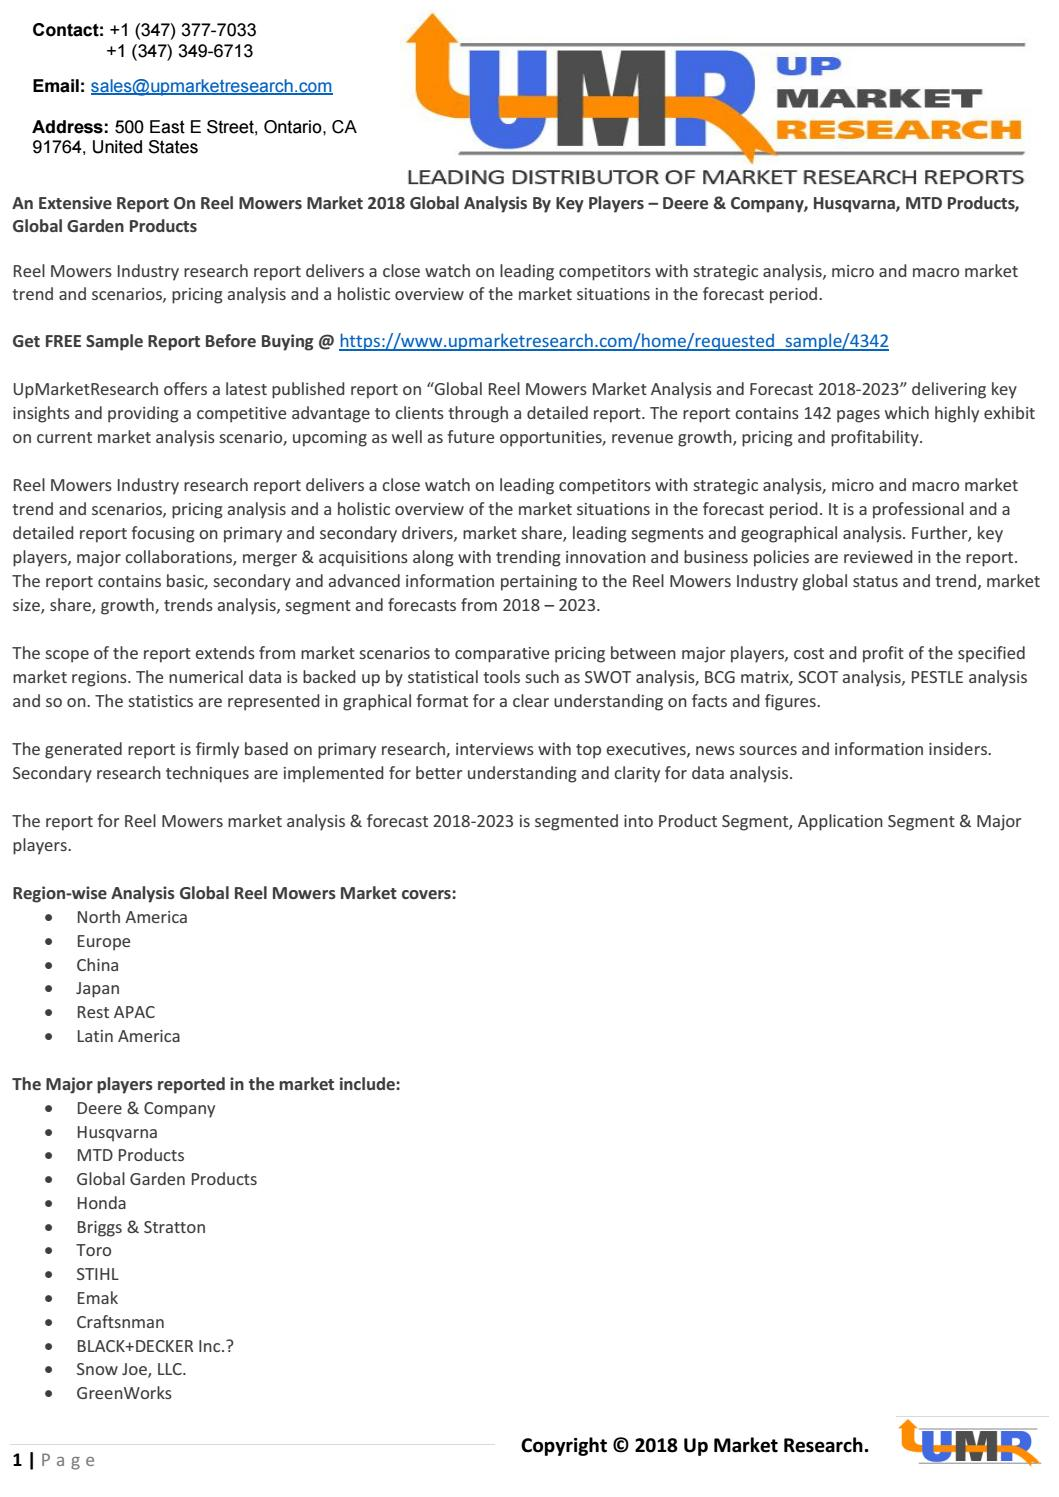 An Extensive Report On Reel Mowers Market 2018 Global